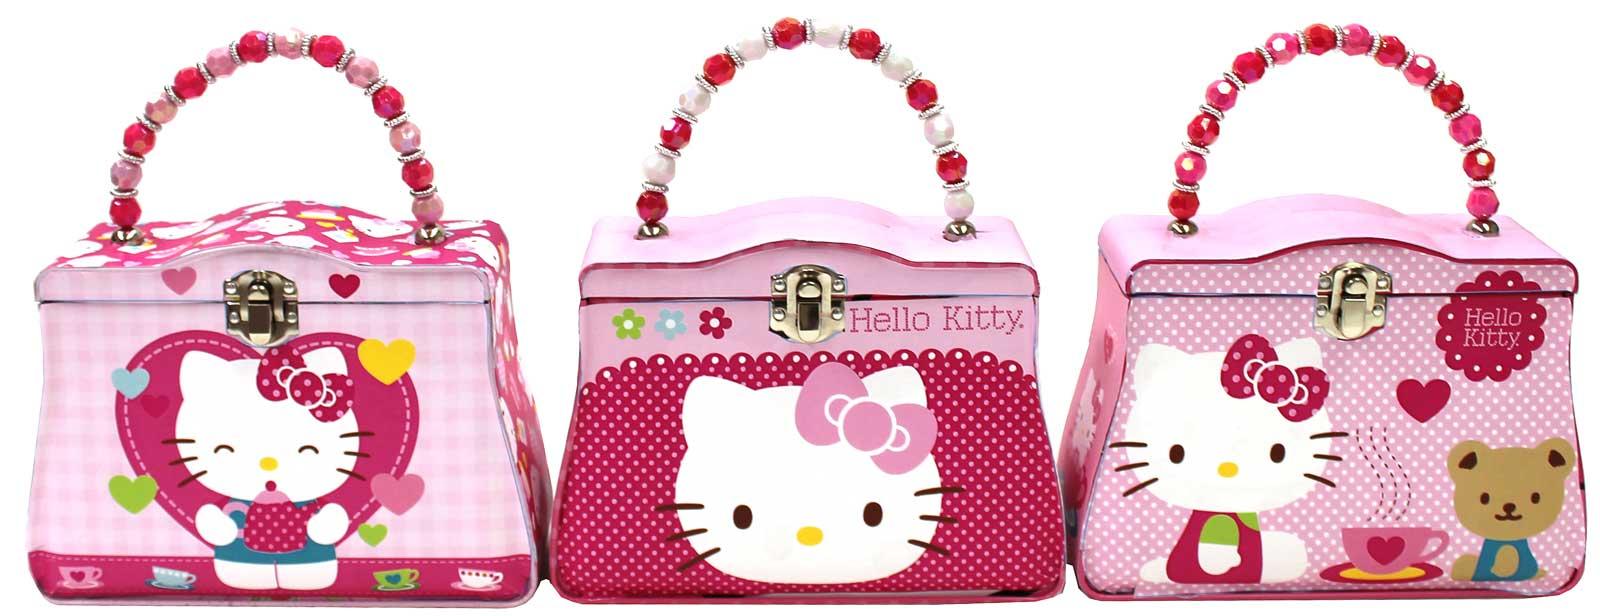 Hello Kitty Tin Box Carry All